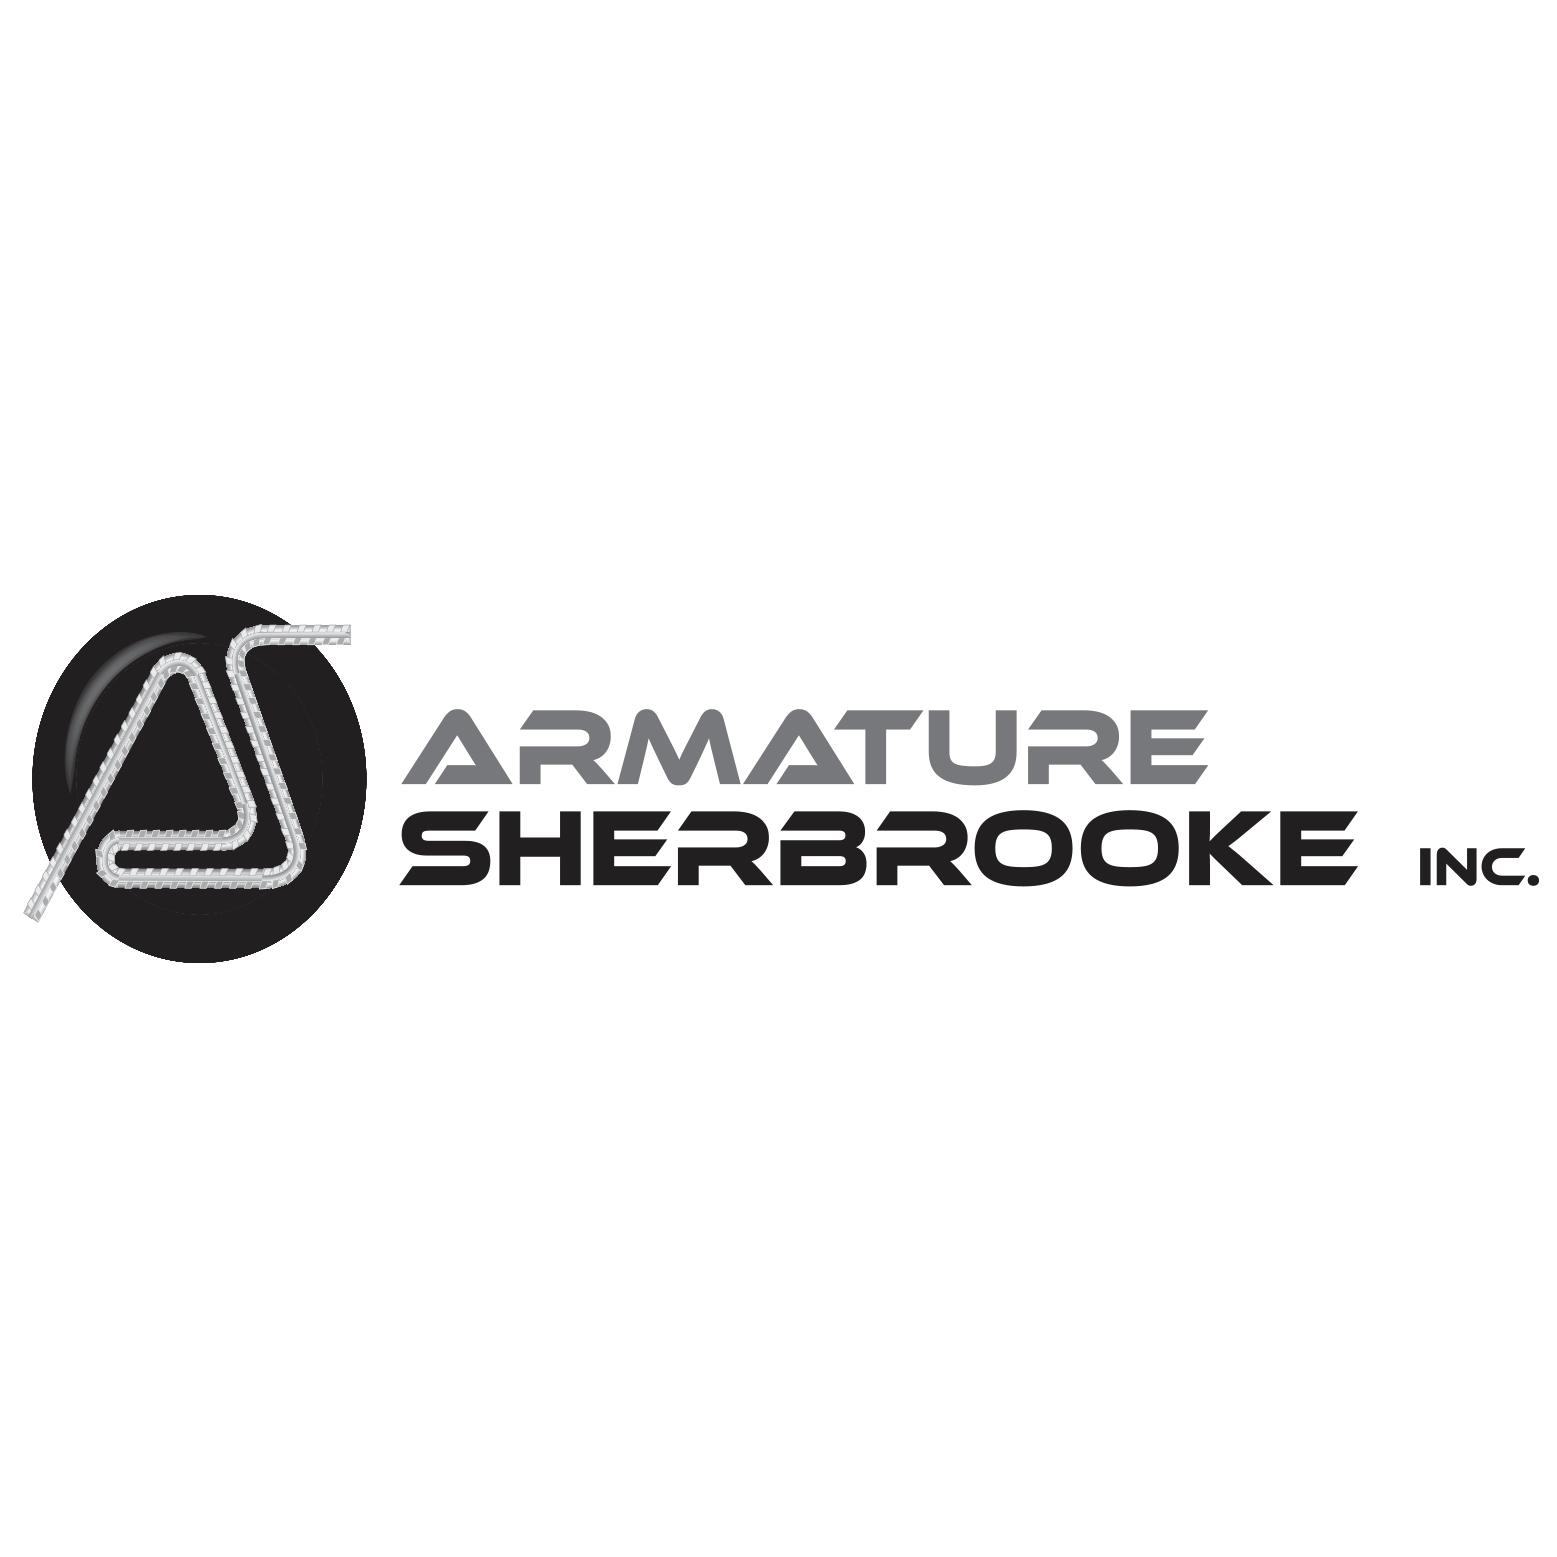 Armature Sherbrooke logo